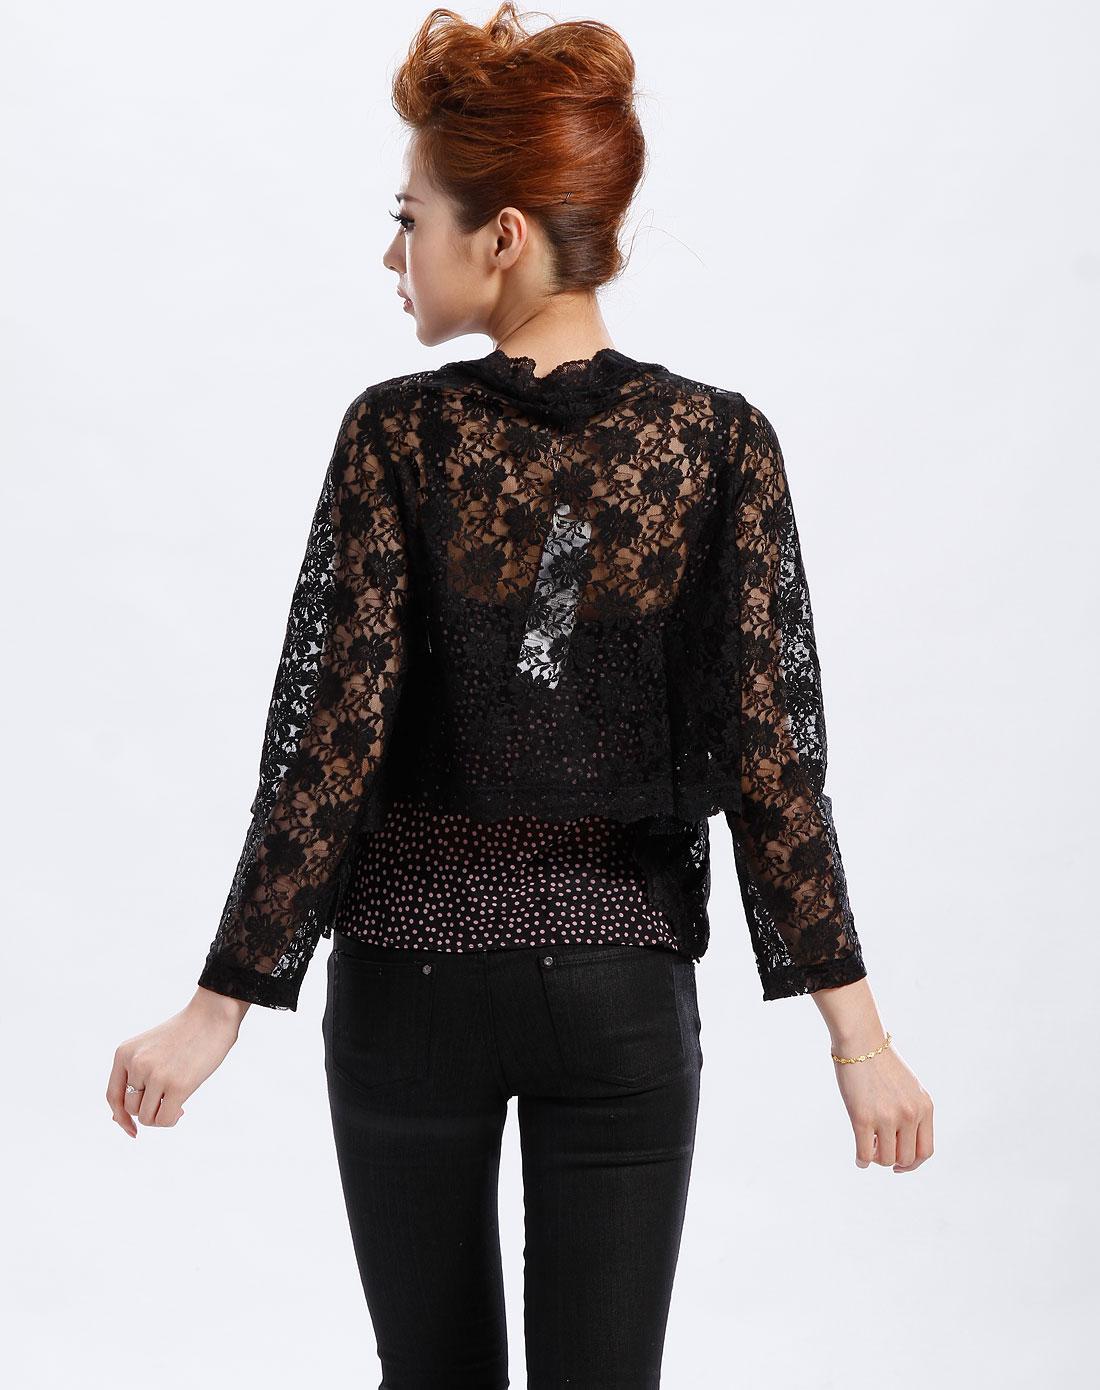 axara黑色镂空花纹长袖外套as7kt15599